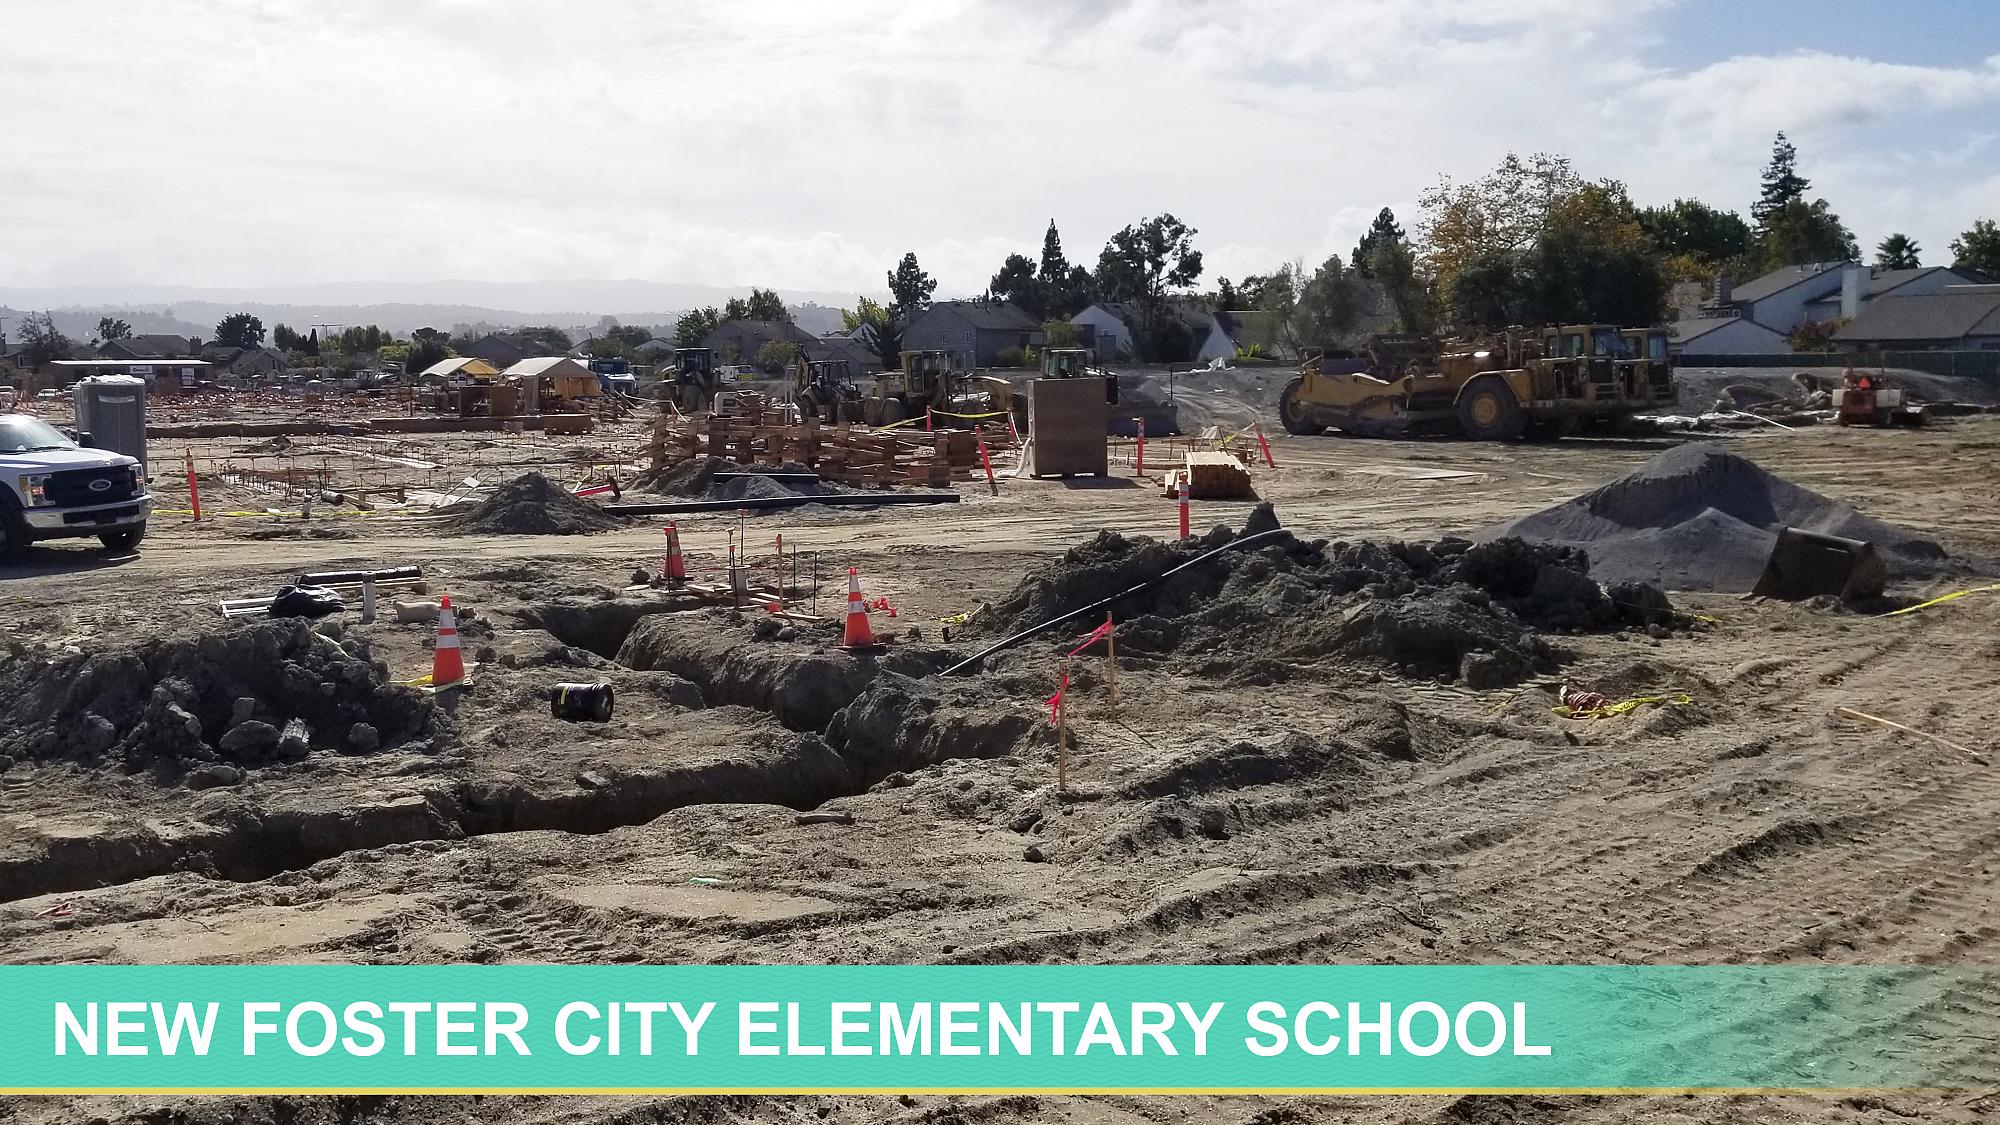 San Mateo Foster City School District - Foster City New Throughout Audubon Calendars 2021 Foster City